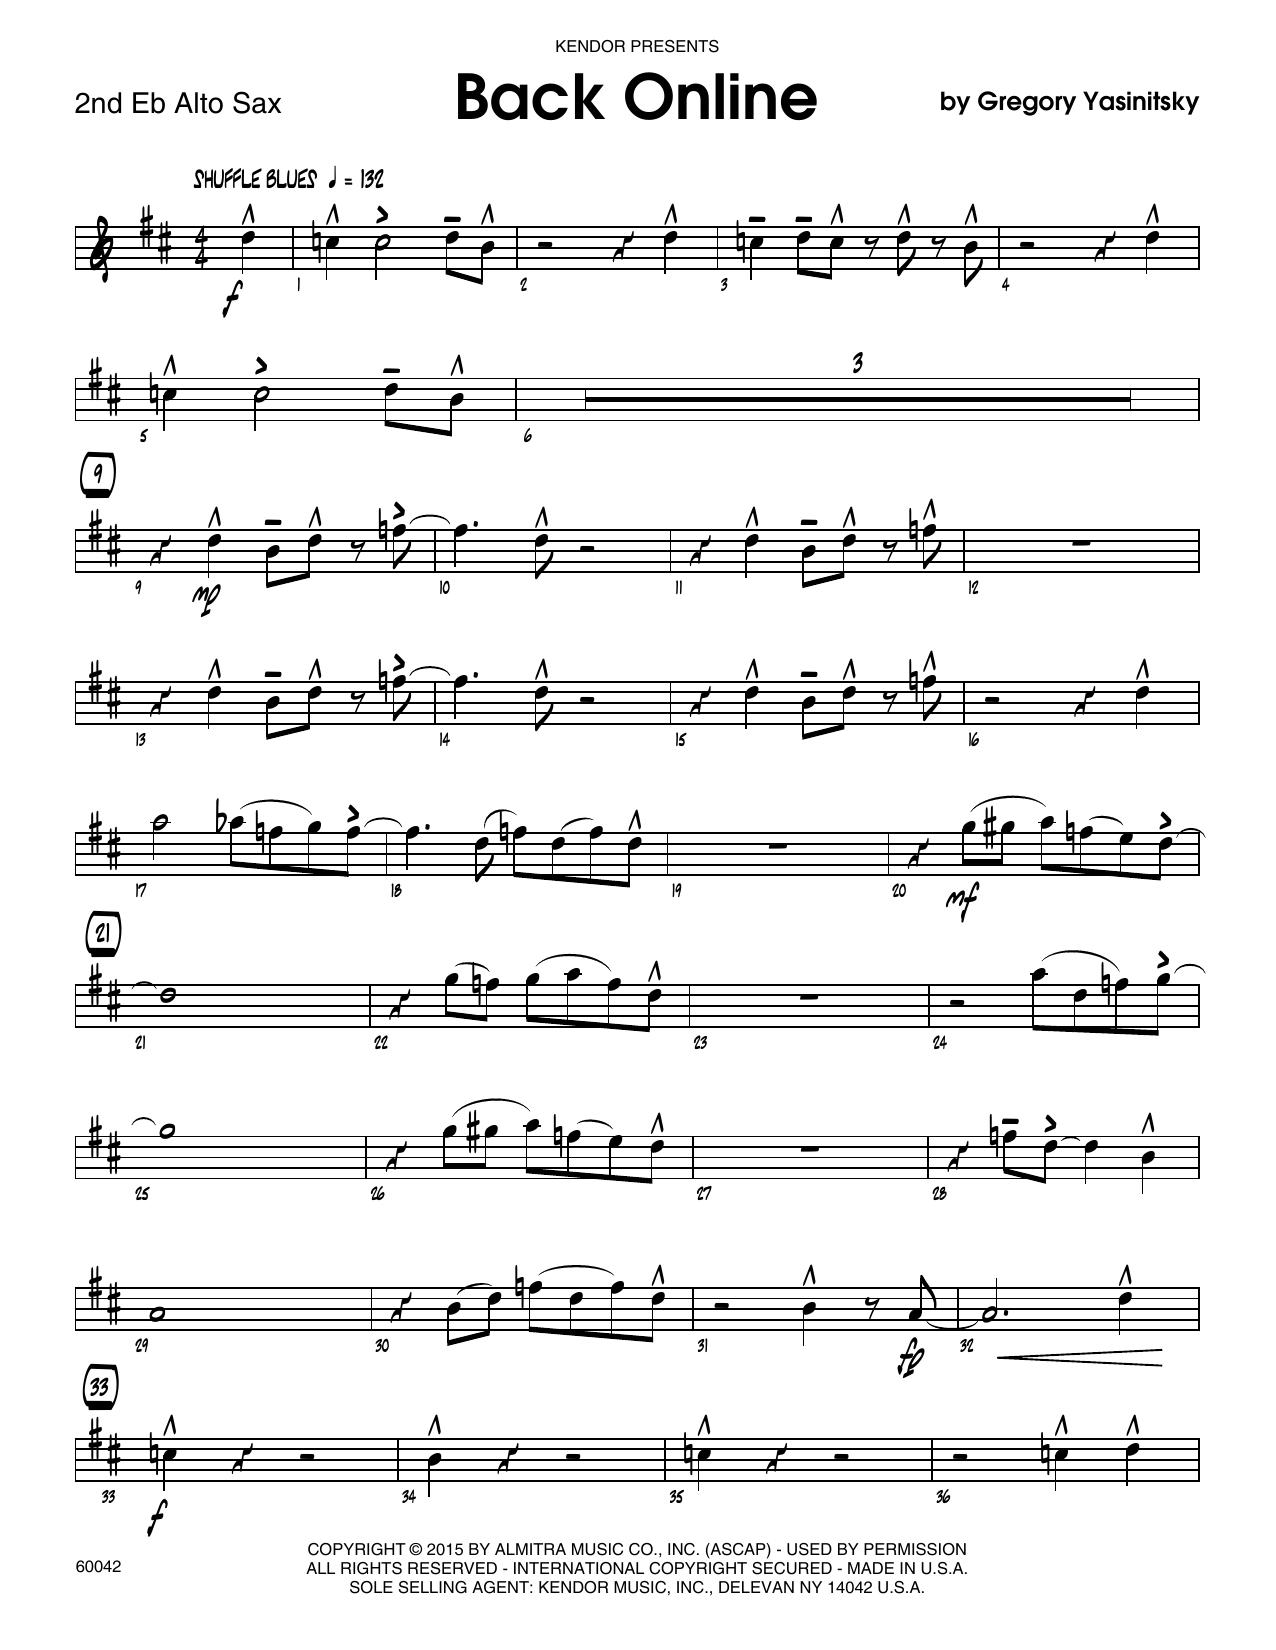 Back Online - 2nd Eb Alto Saxophone Sheet Music